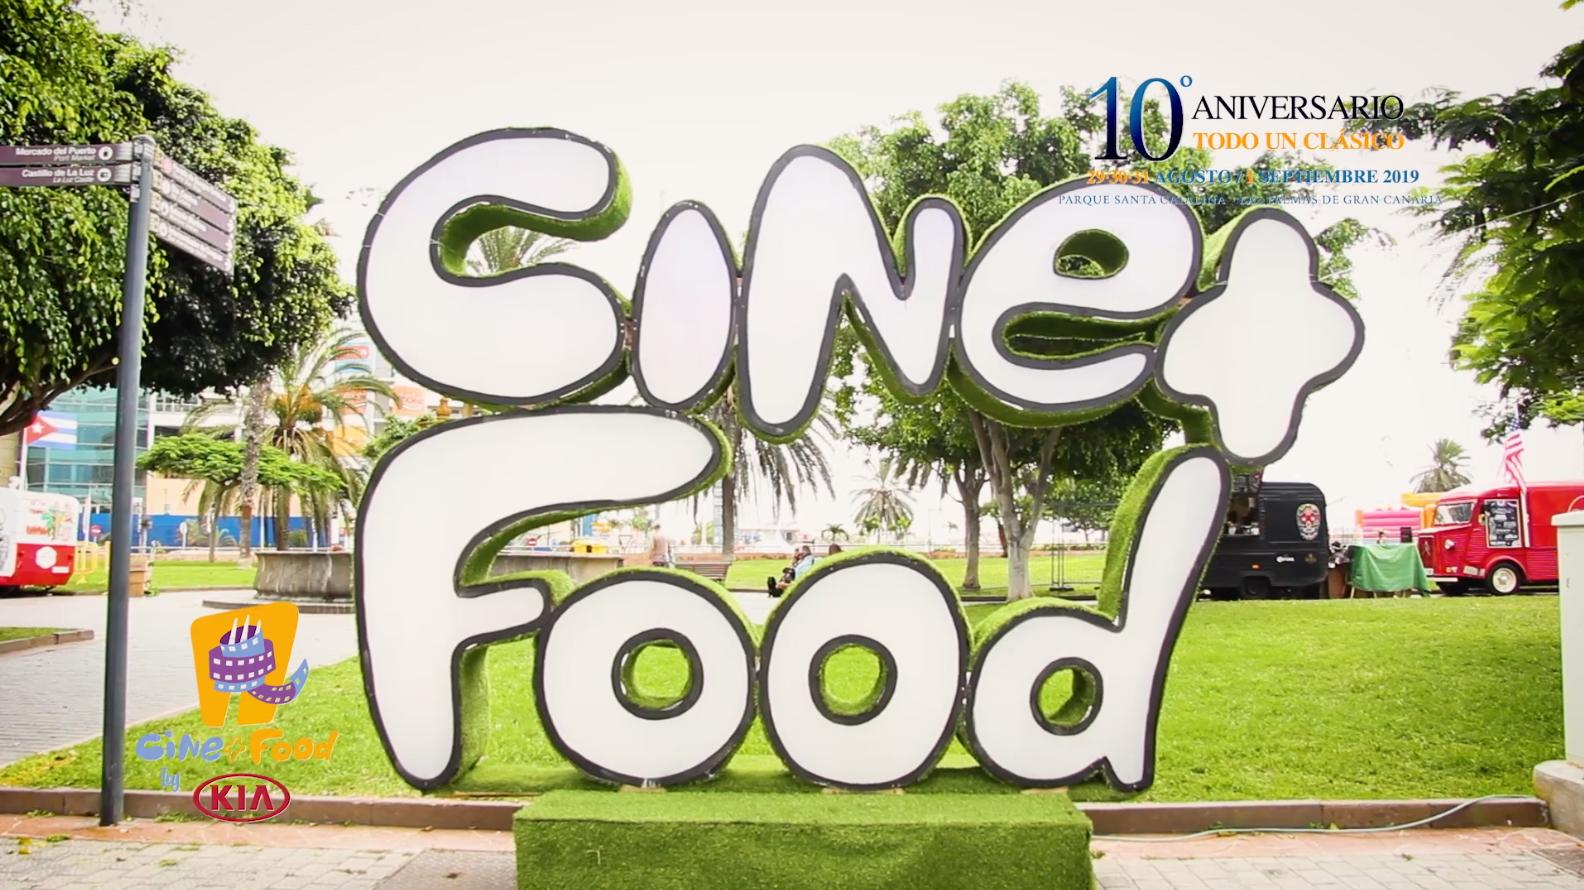 SPOT CINE+FOOD